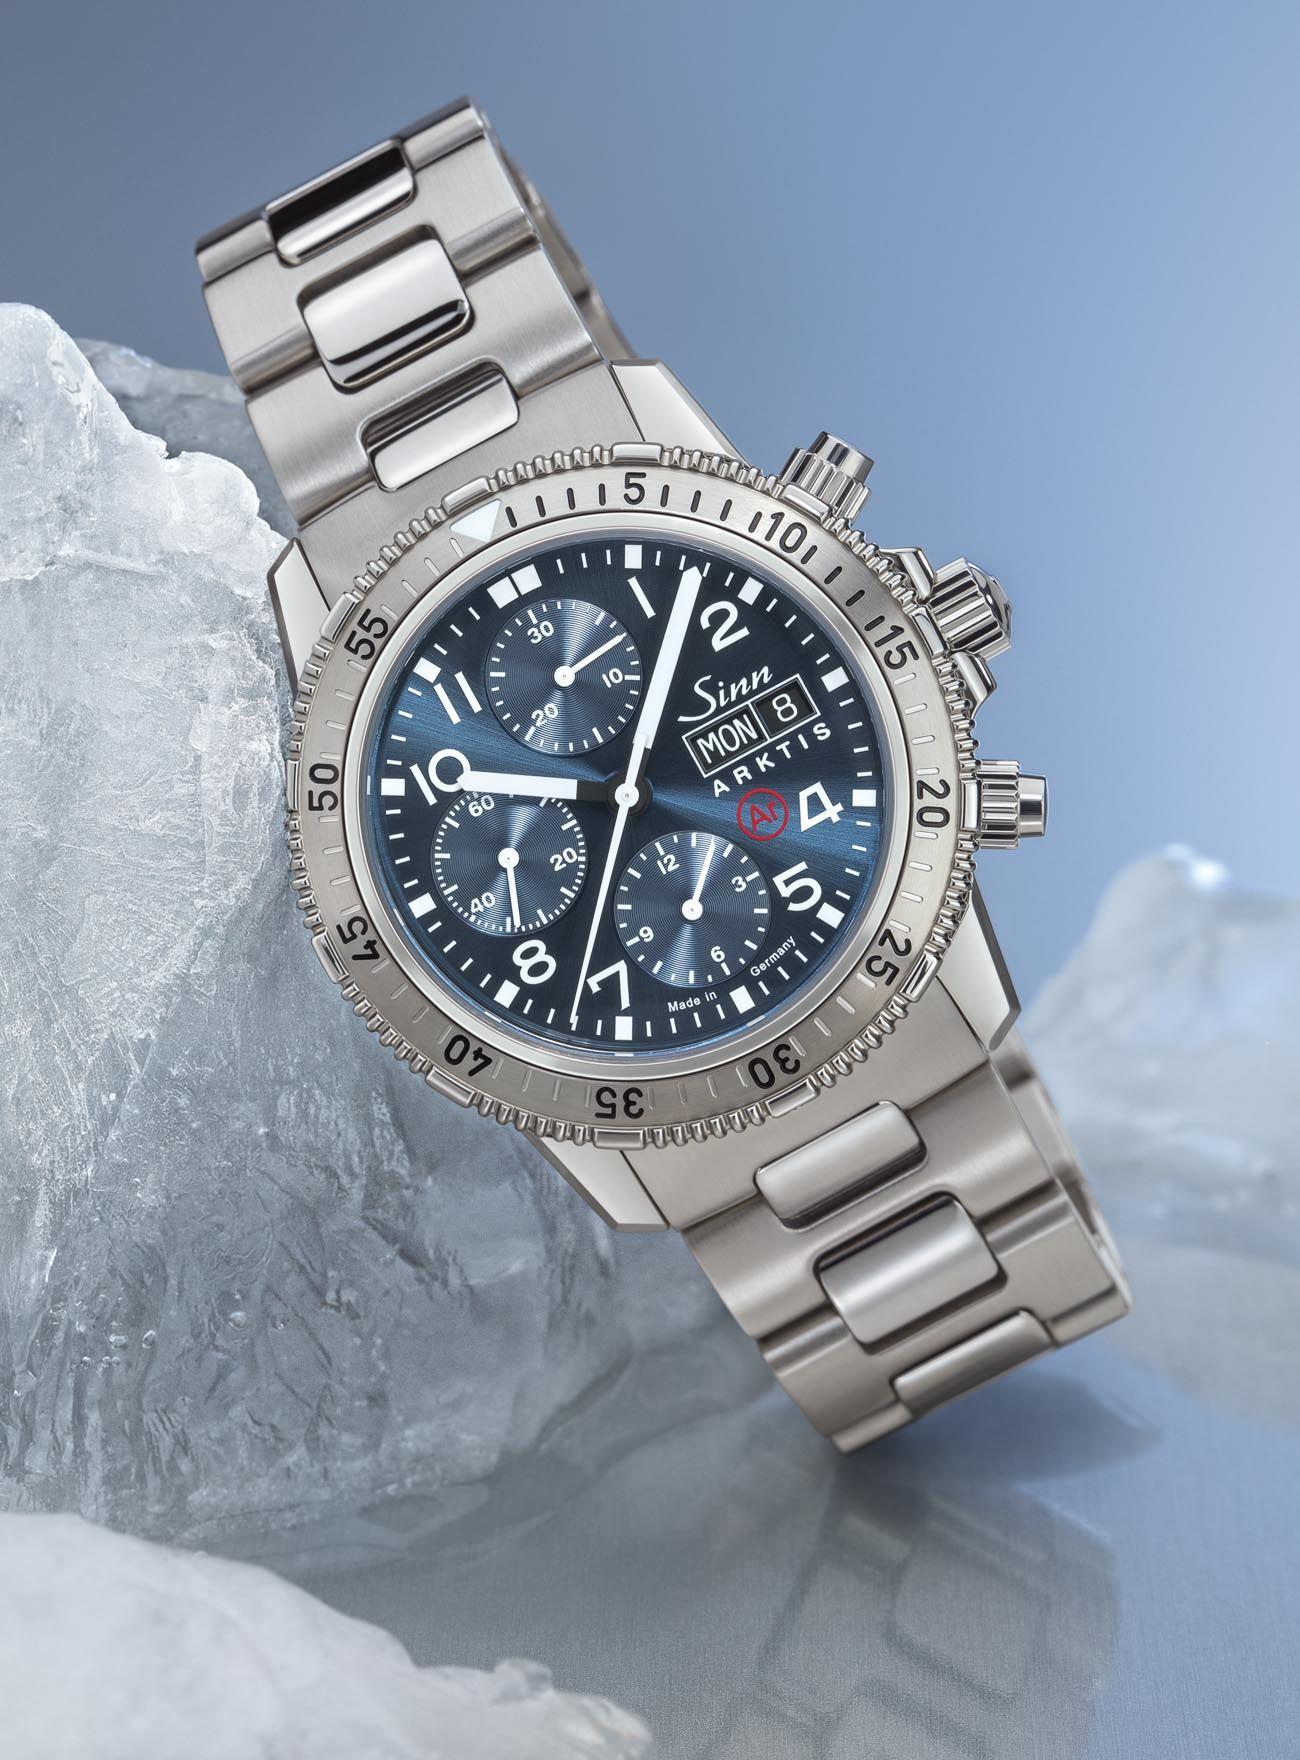 6818973d88fe Sinn 206 Arktis II Watch Is Modern Remake Of The 203 Arktis Watch Releases